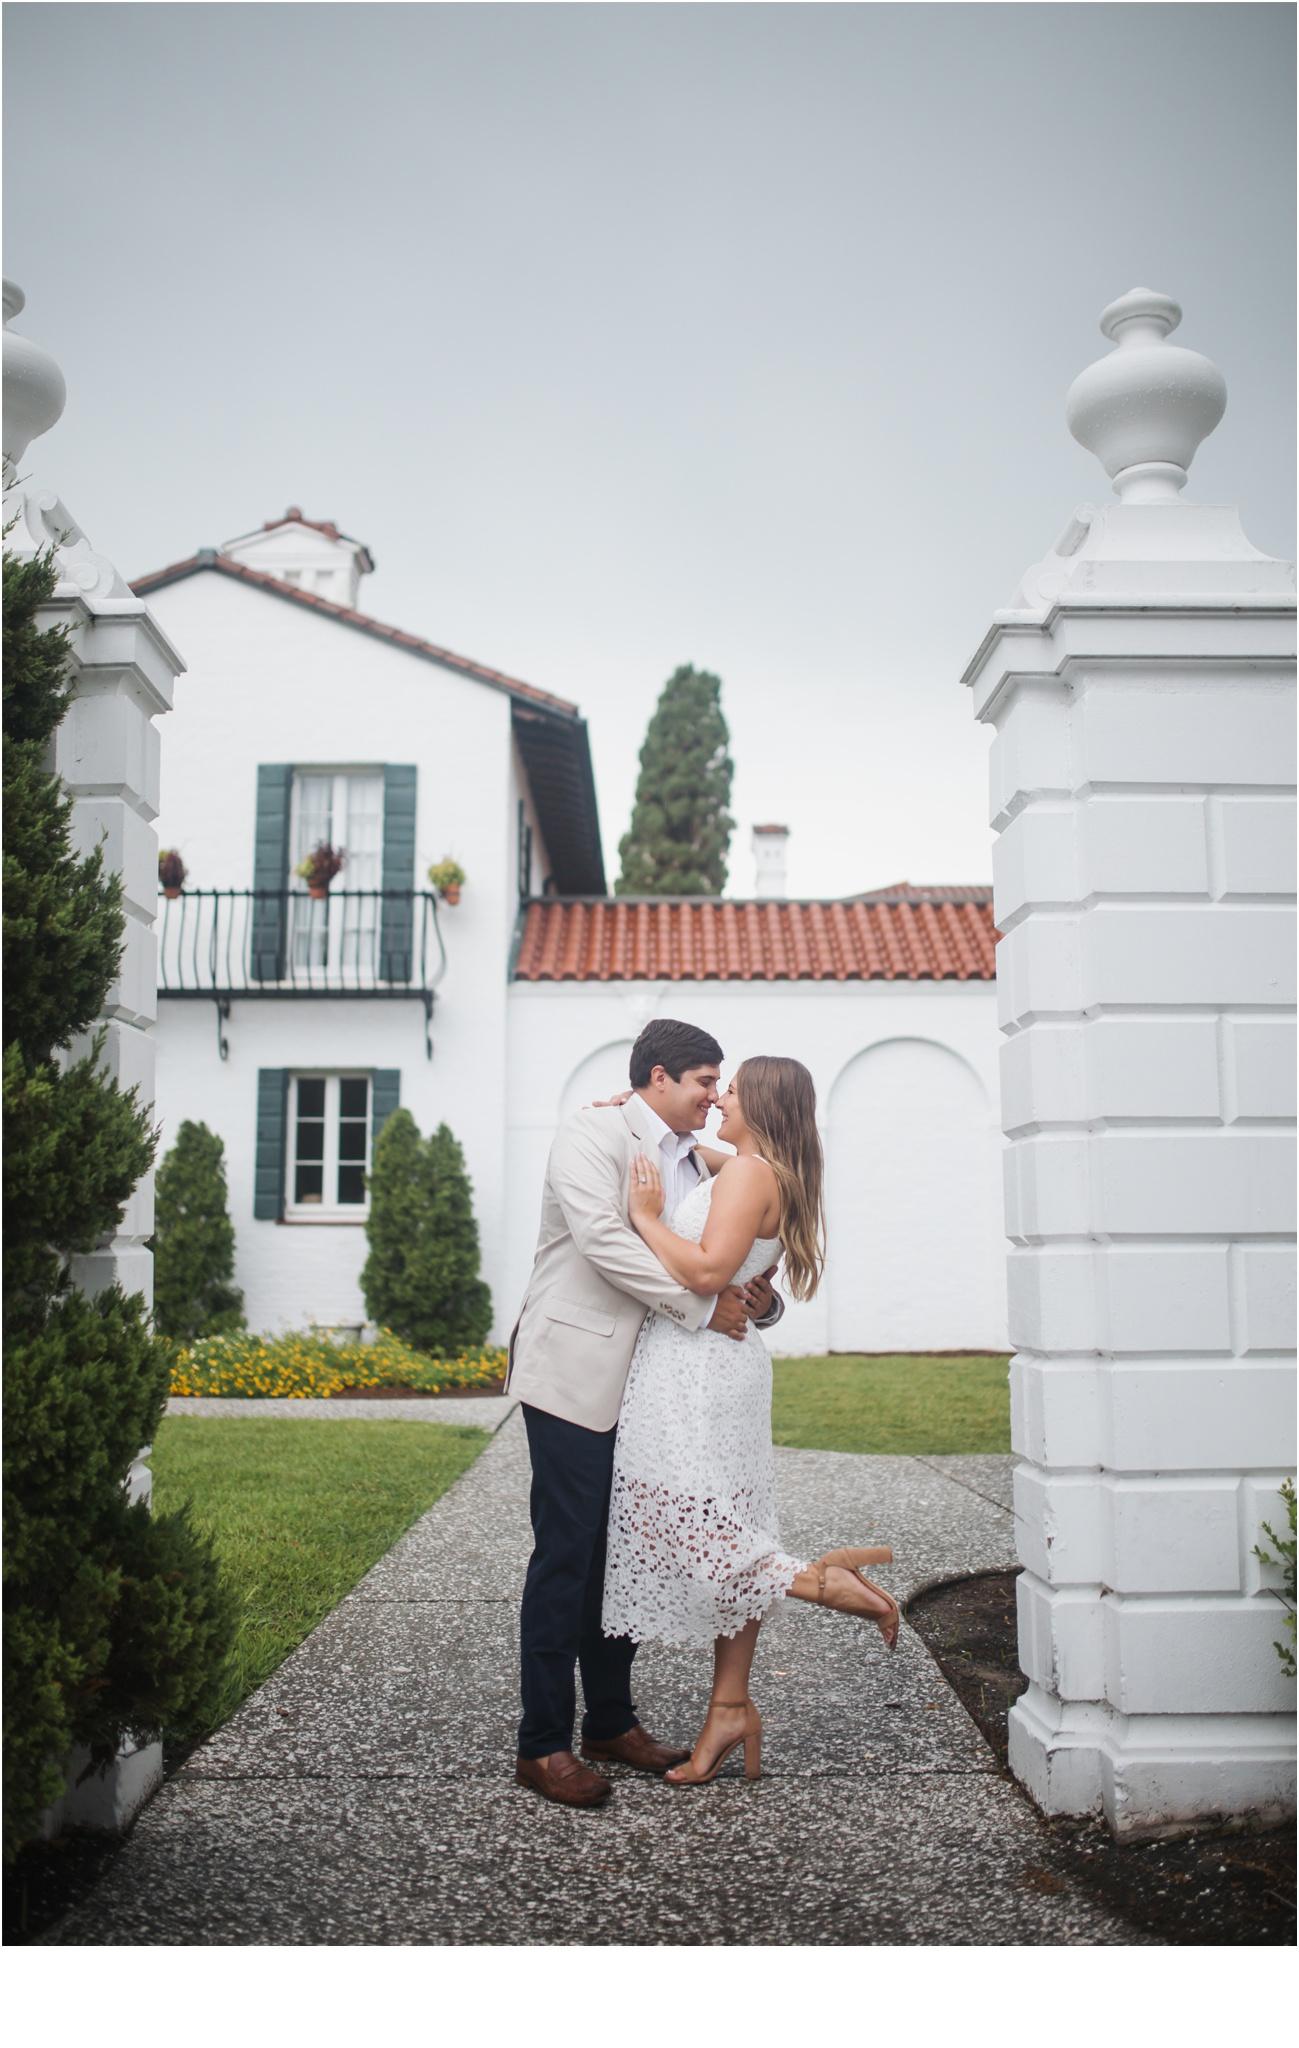 Rainey_Gregg_Photography_St._Simons_Island_Georgia_California_Wedding_Portrait_Photography_1124.jpg